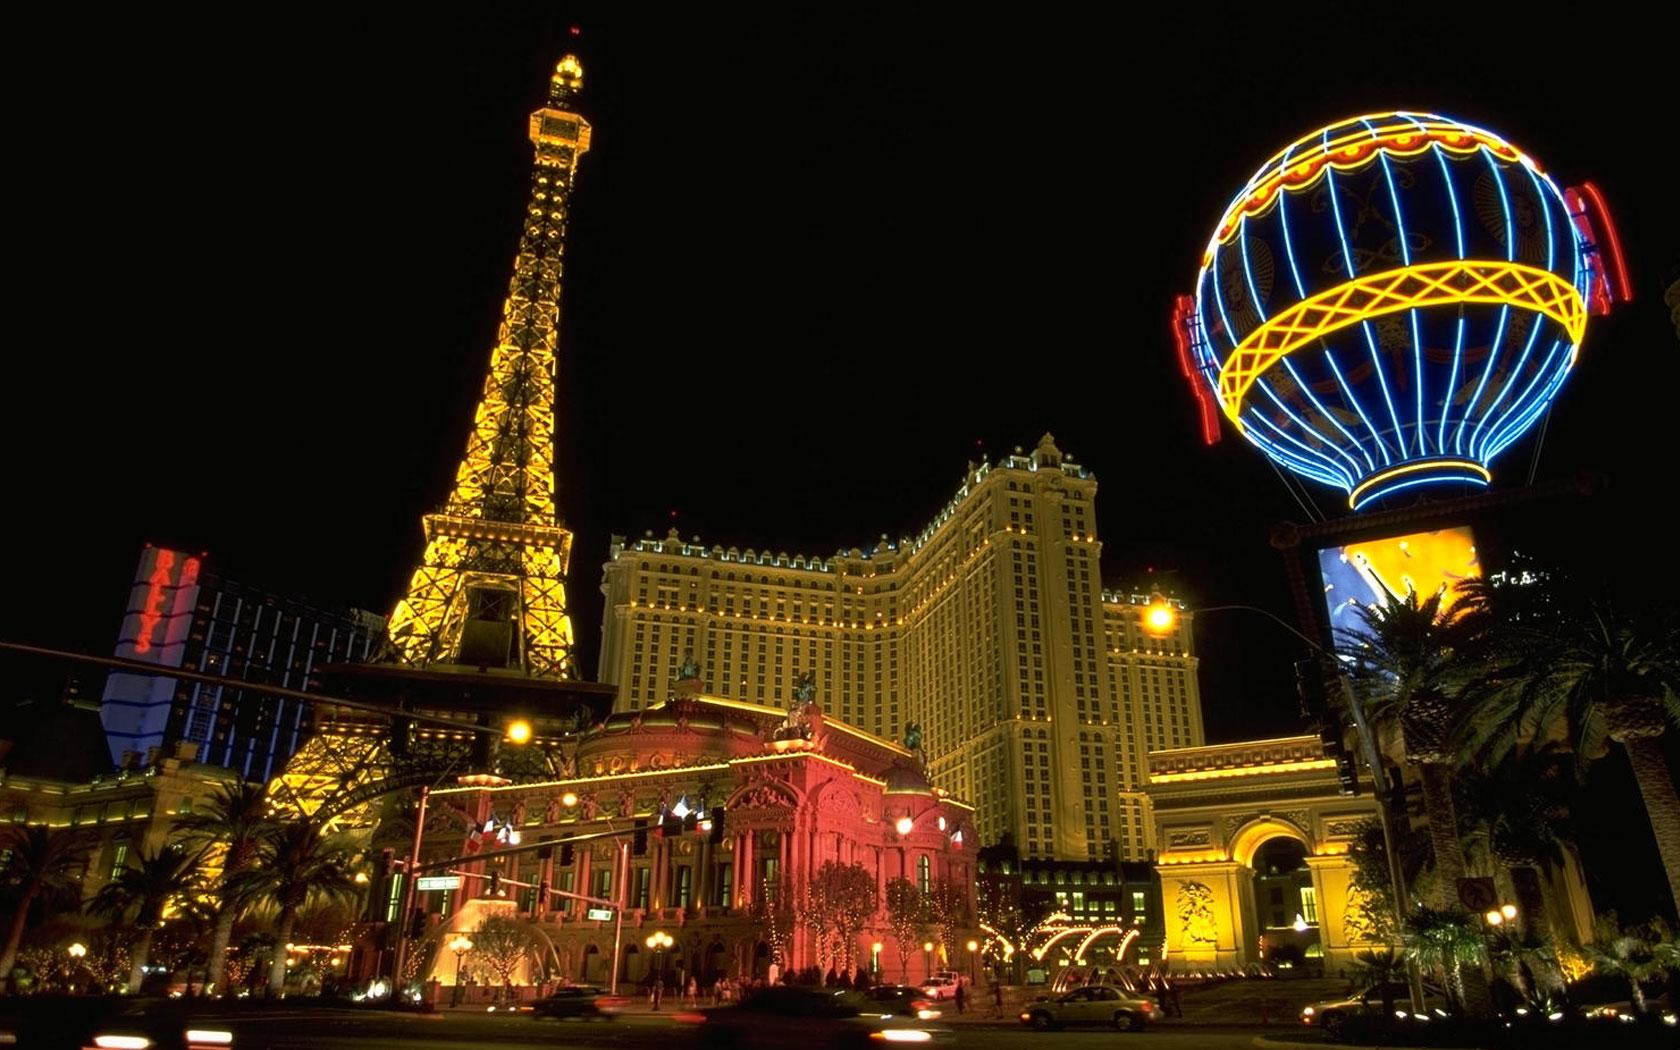 париж казино картинки